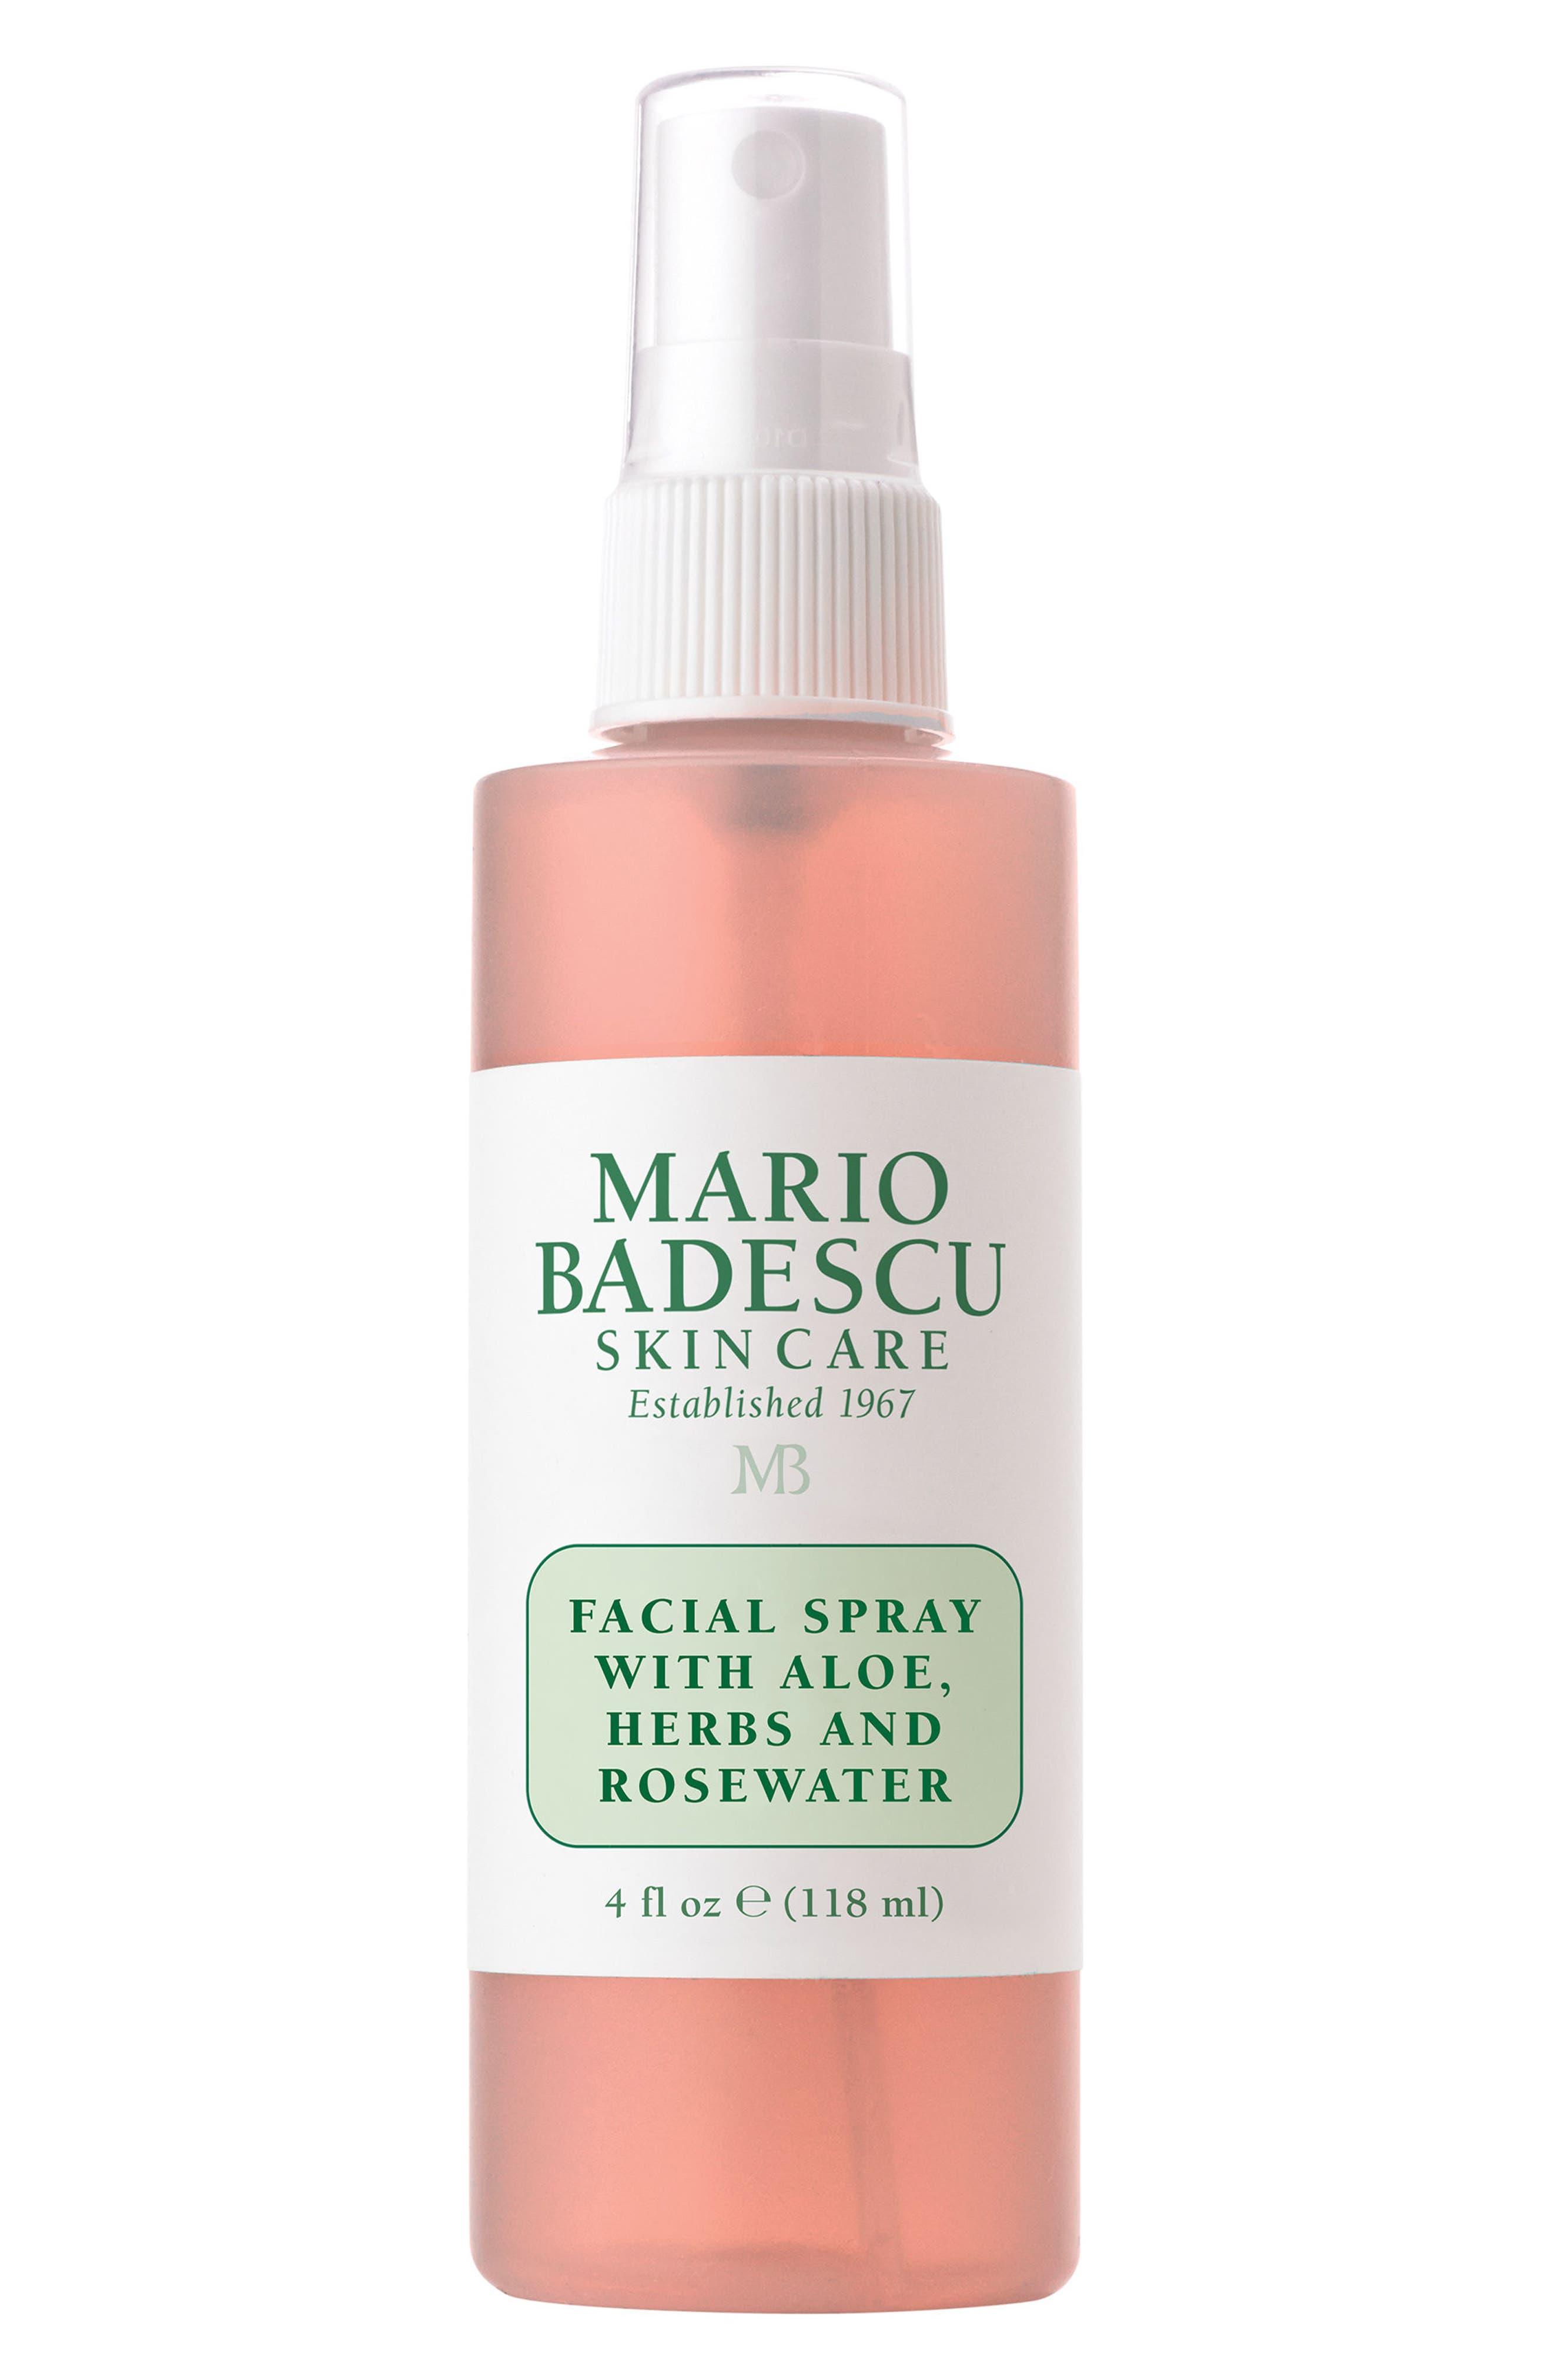 MARIO BADESCU Facial Spray with Aloe, Herbs & Rosewater, Main, color, NO COLOR